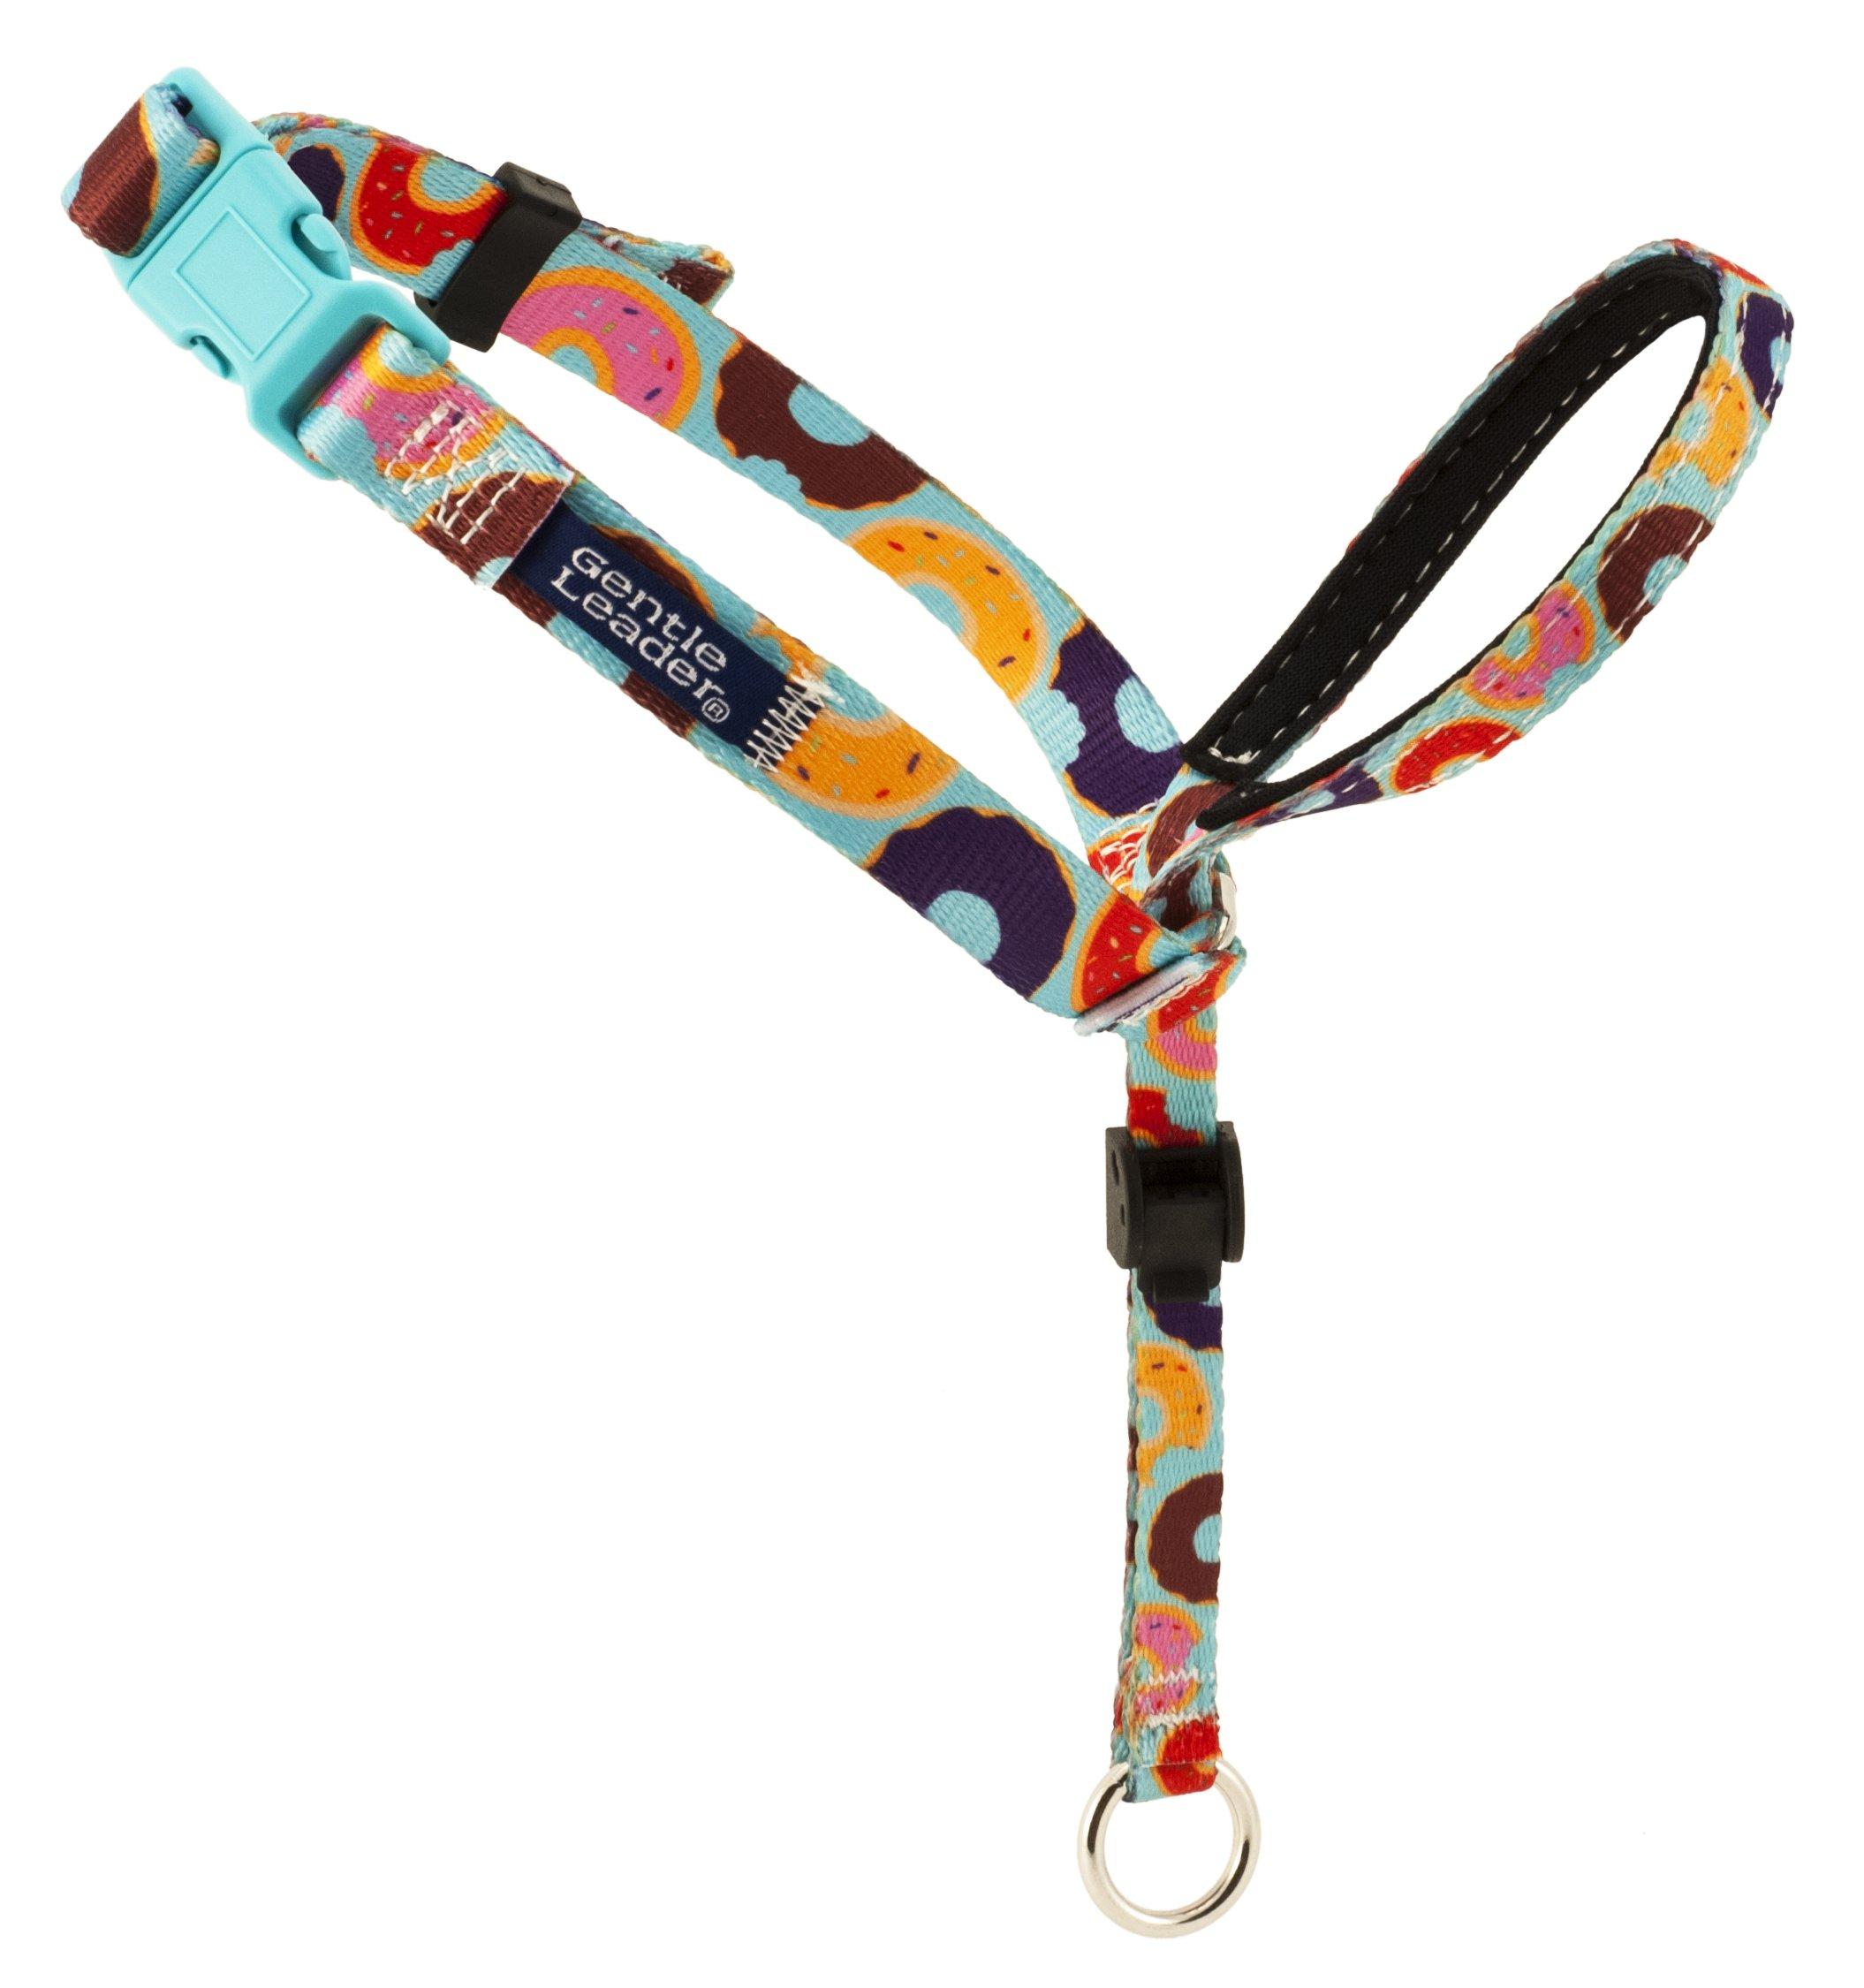 PetSafe Gentle Leader Chic Head Collar, Medium, Donuts - GL-HC-C-M-DNT by PetSafe